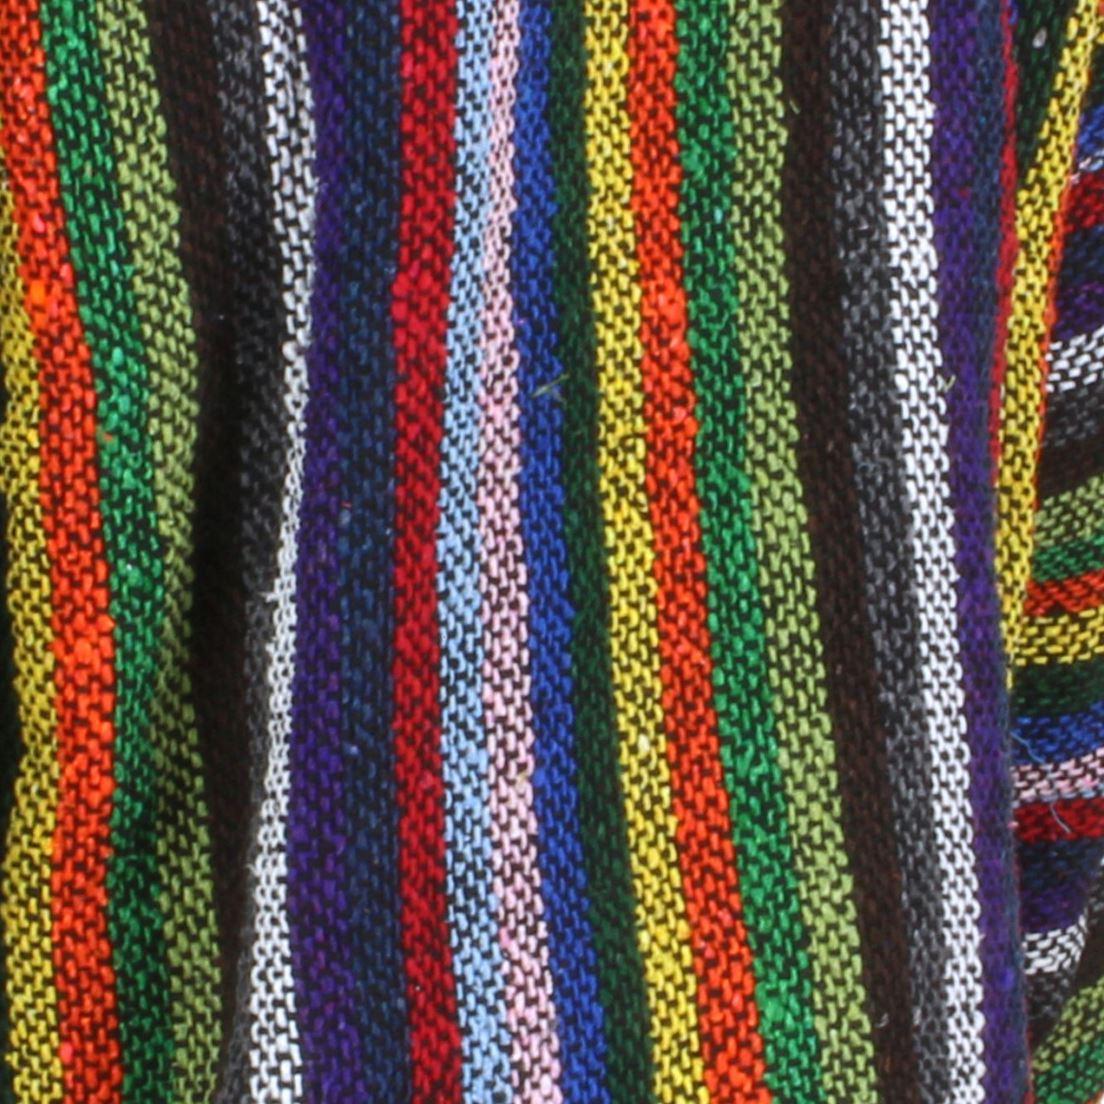 Mexican-Baja-Hoodie-Hoody-Jerga-Rug-Jumper-Siesta-Surf-Hippy-Baha-Pullover thumbnail 20